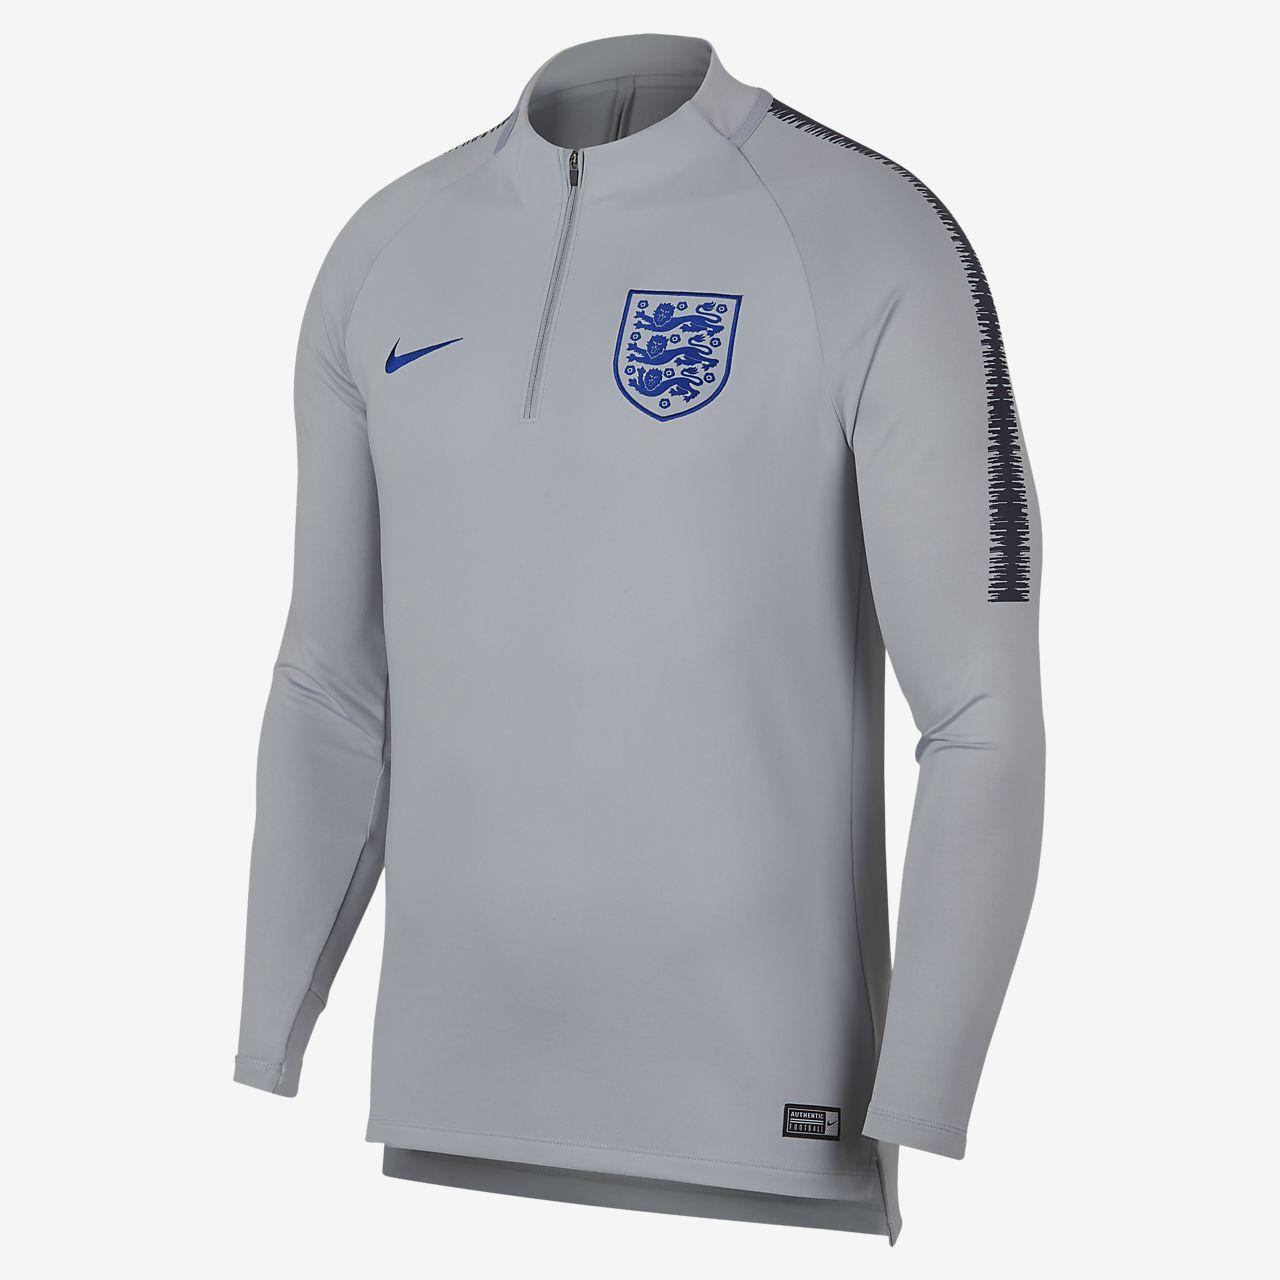 2c8615dac88a England Dri-FIT Squad Drill Men s Long-Sleeve Football Top. Nike.com GB